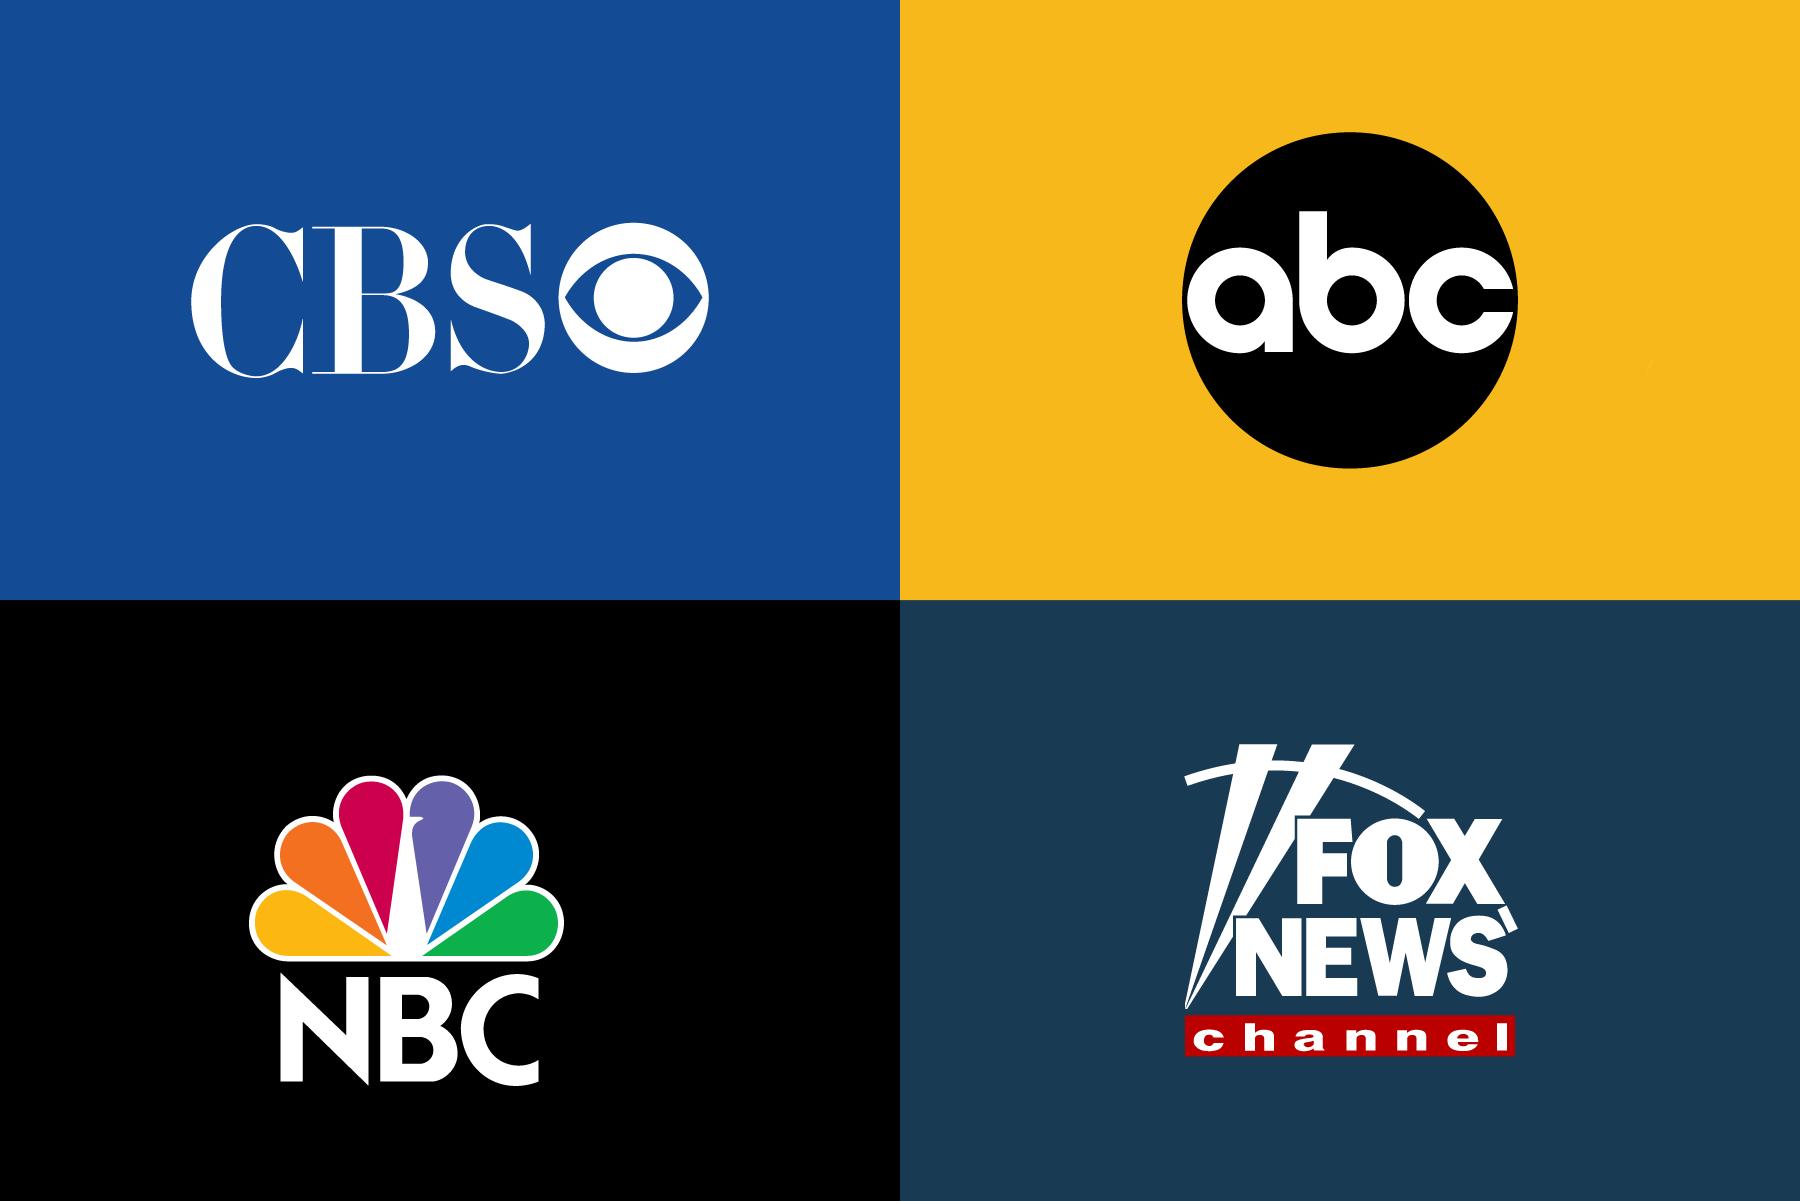 CBS ABC NBC Fox Media